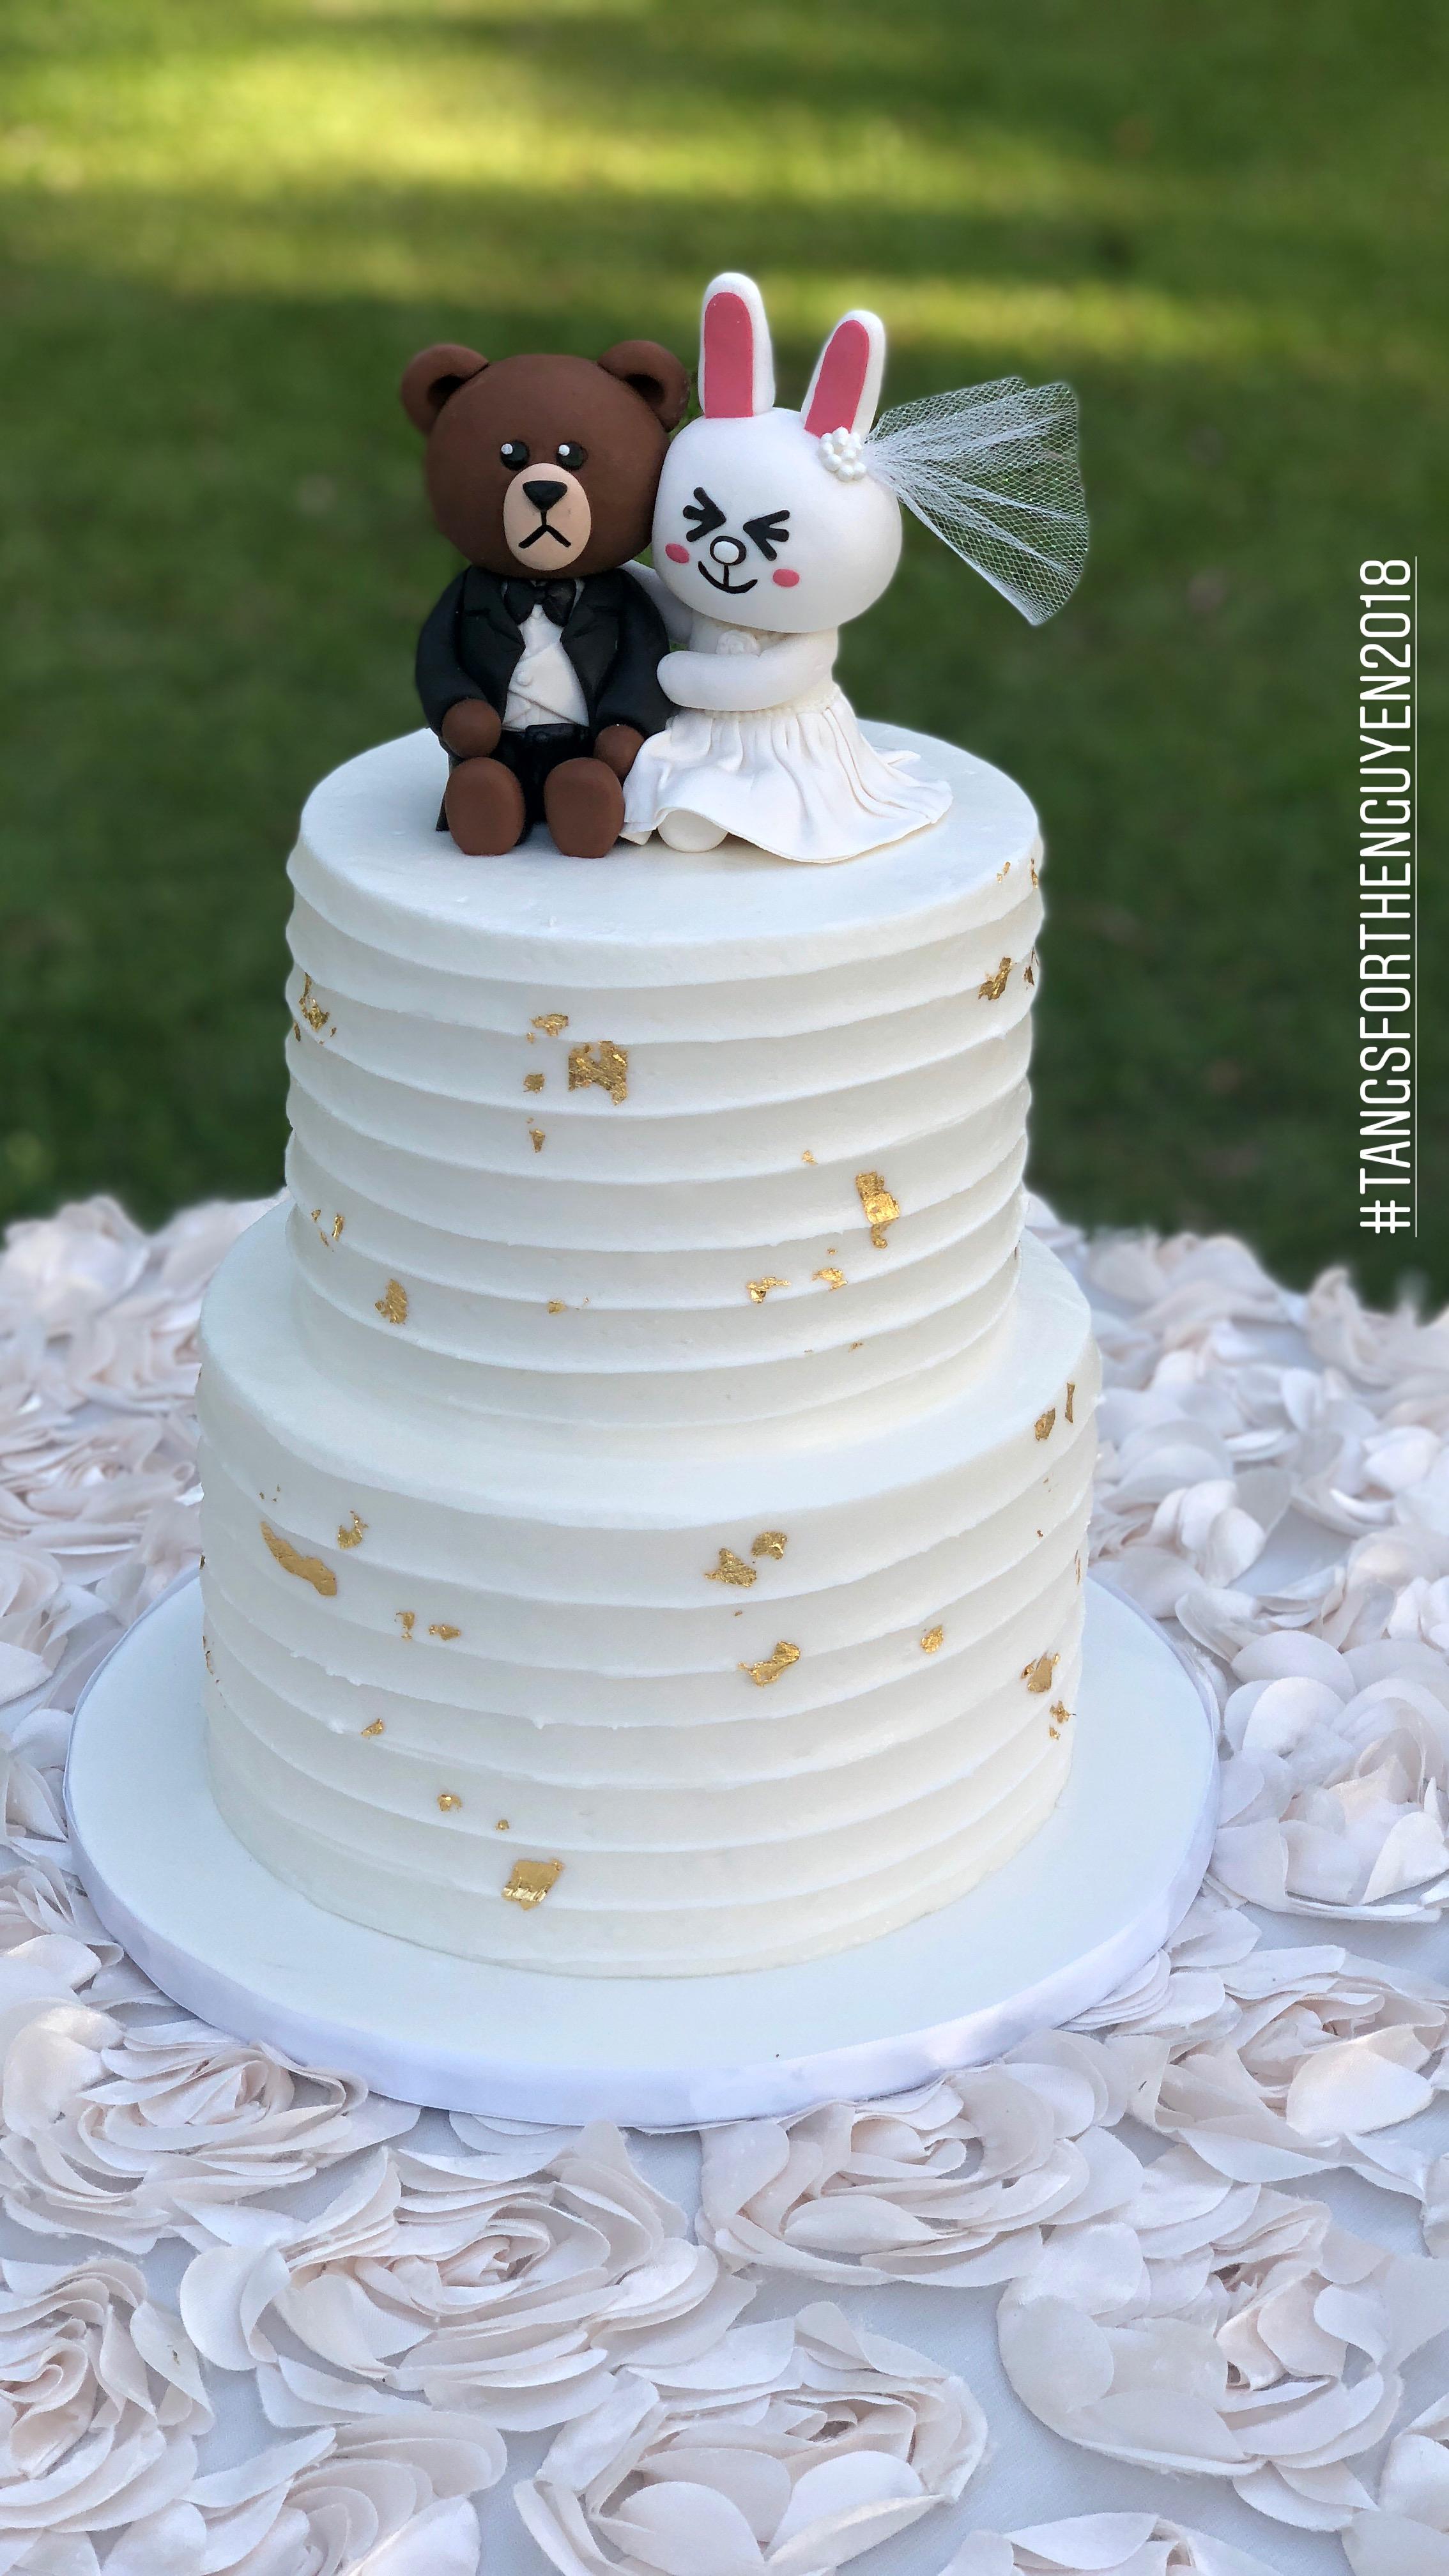 Wedding | A Cake Life